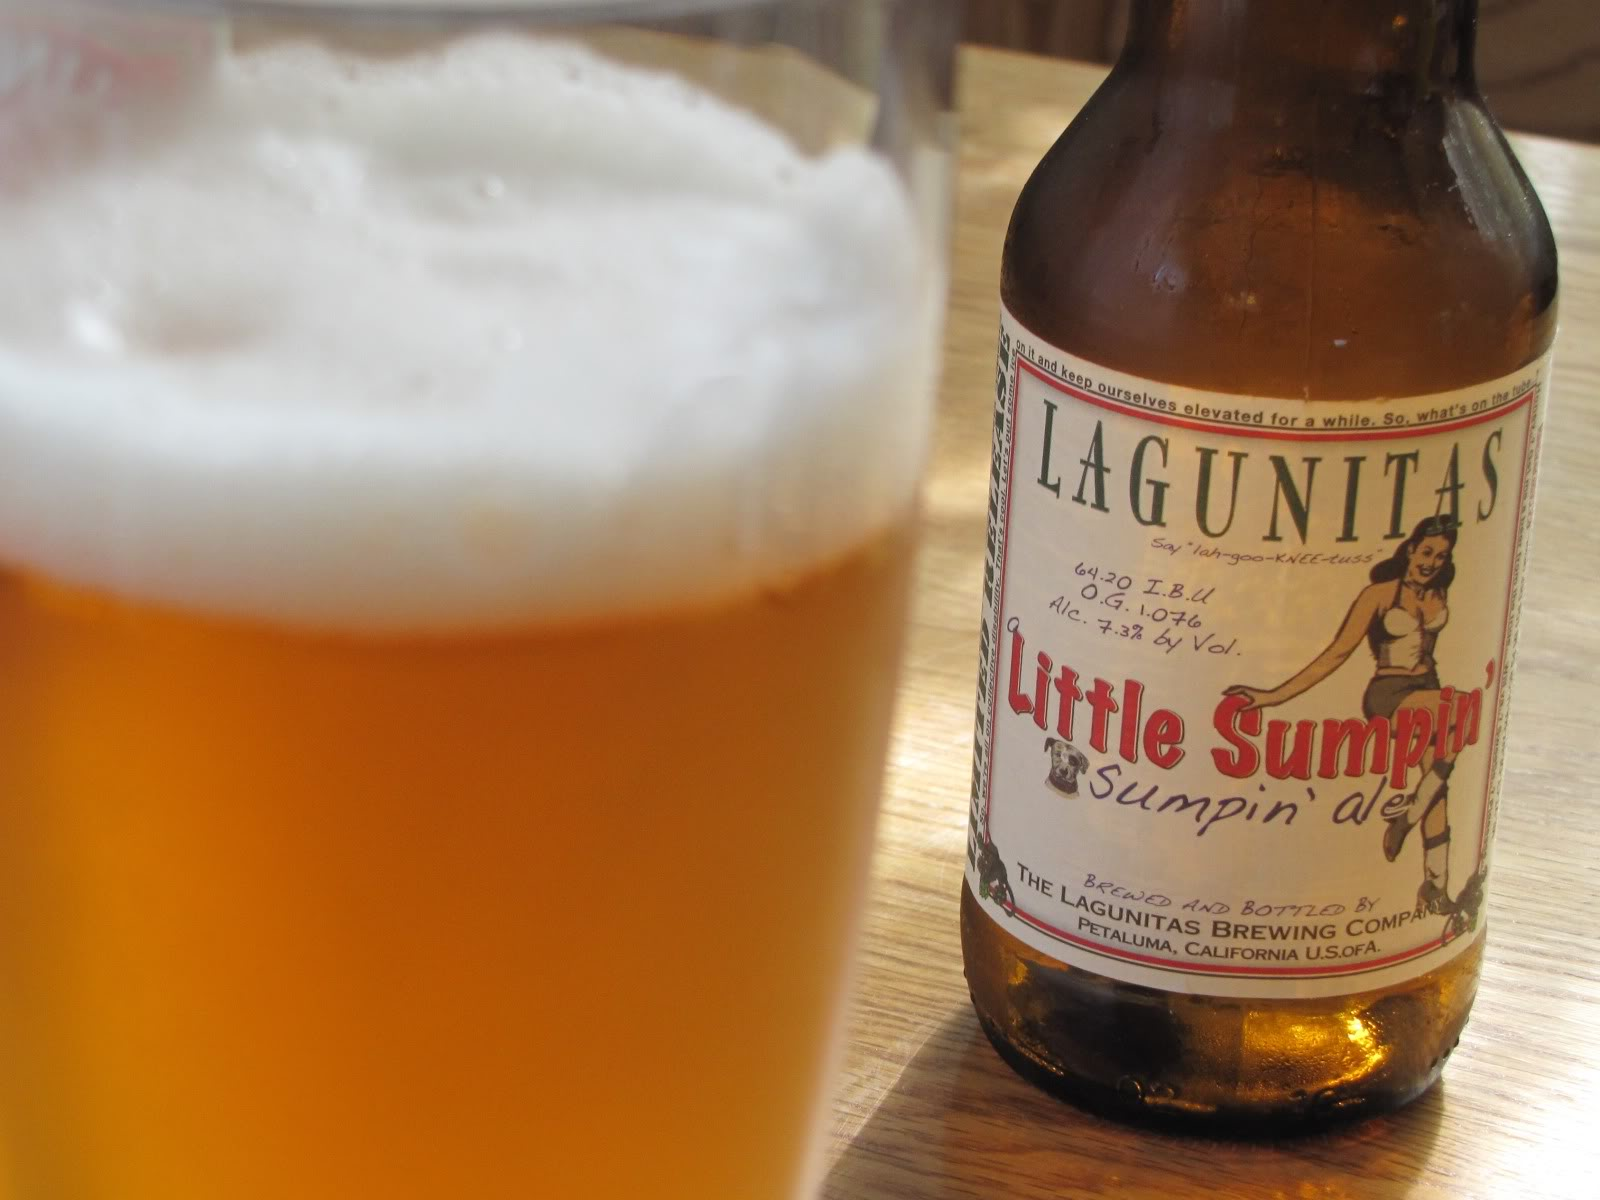 Lagunitas Little Sumpin' Sumpin' – wheat beer